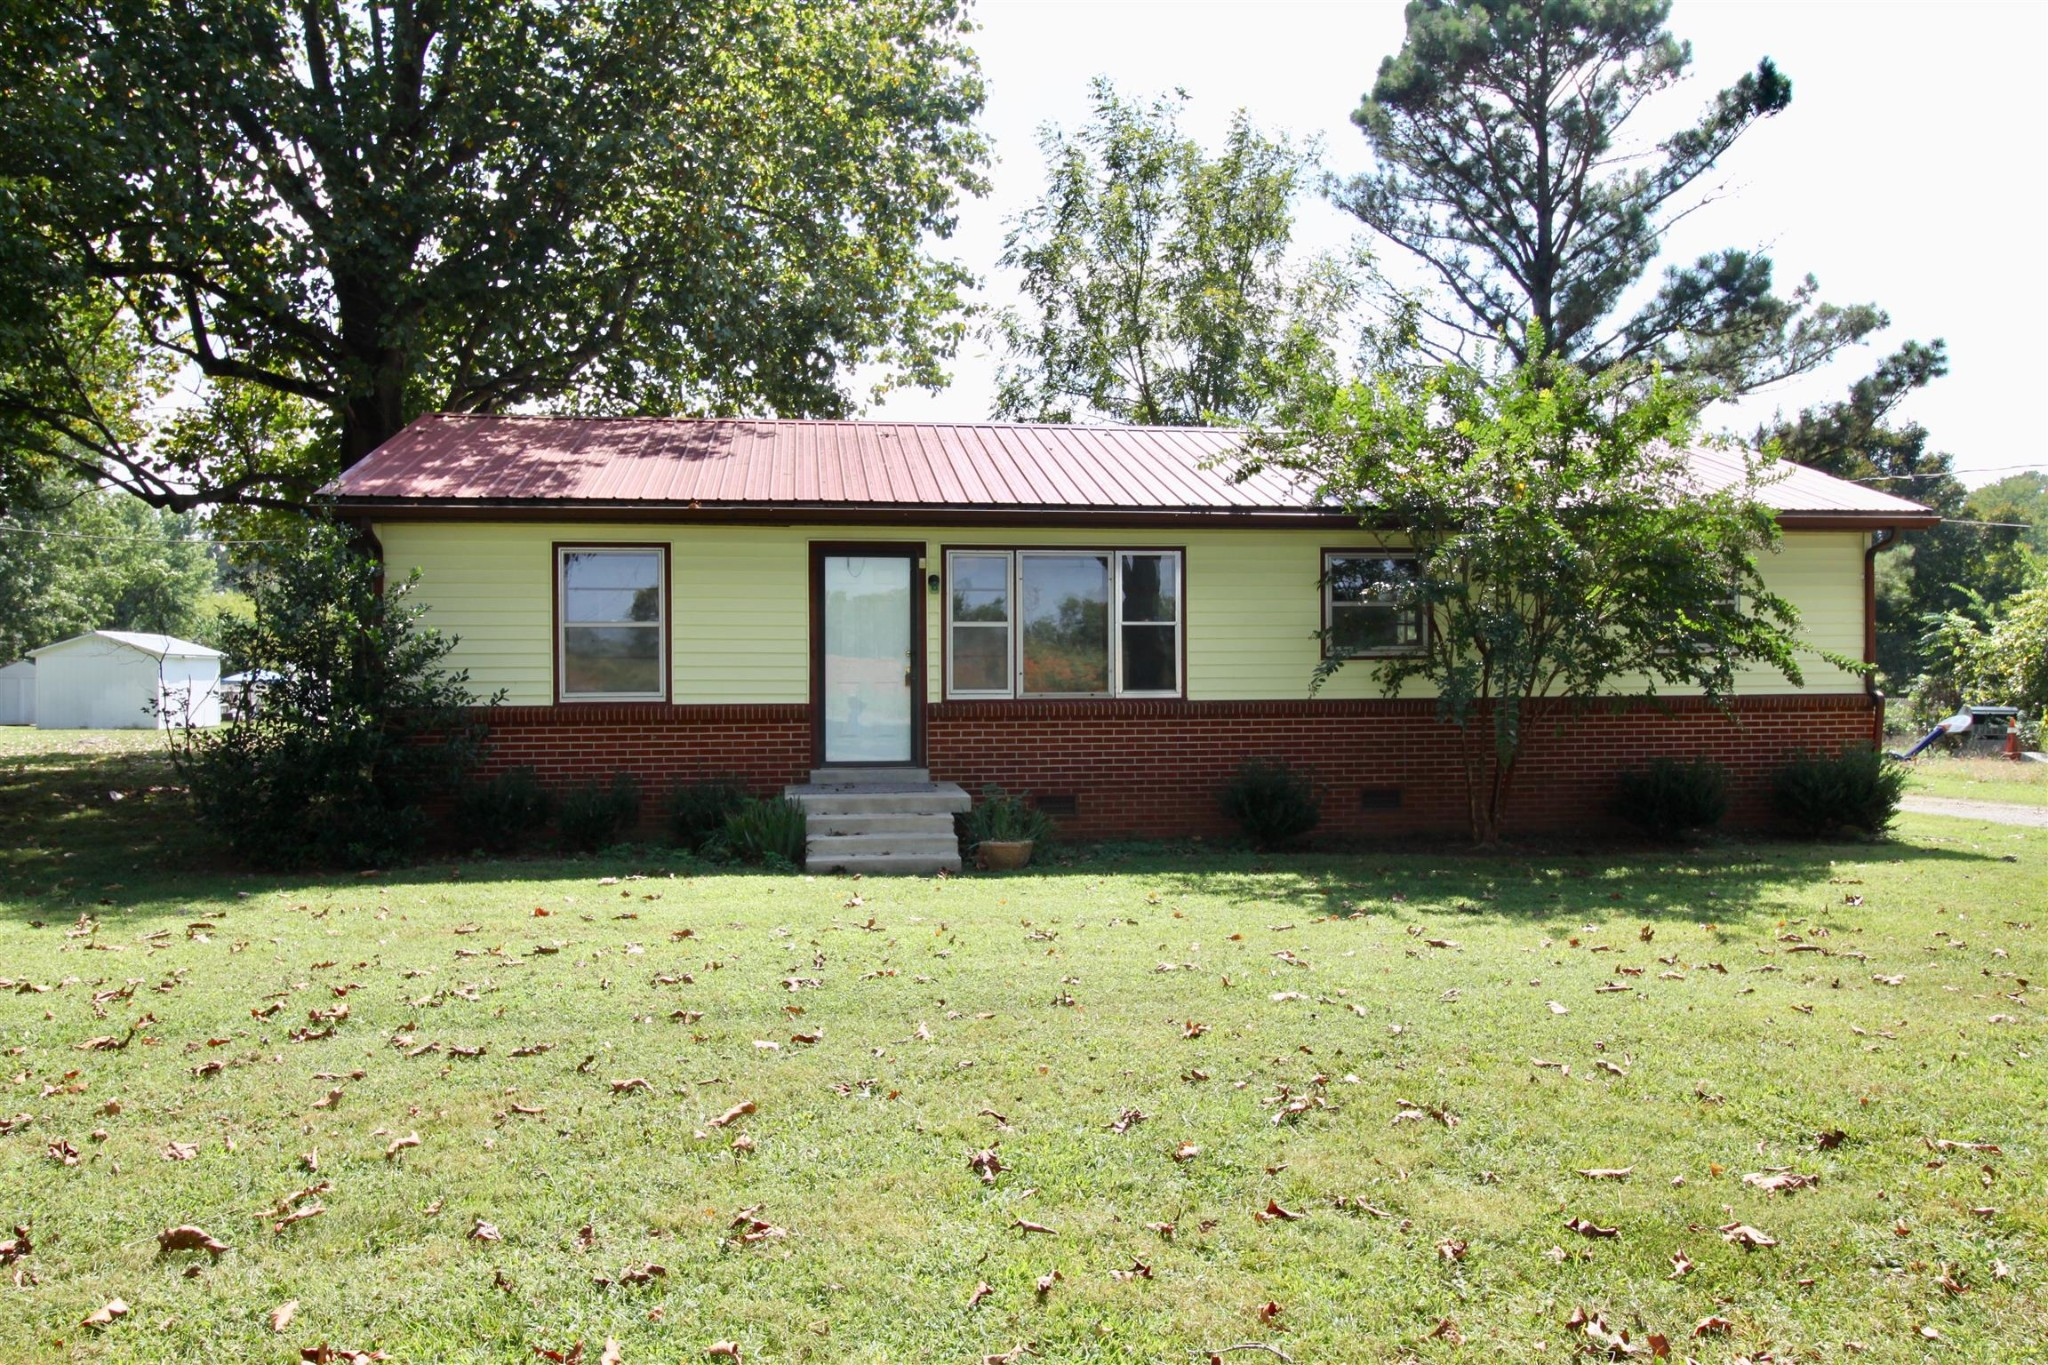 1064 Unionville Deason Rd, Shelbyville, TN 37160 - Shelbyville, TN real estate listing